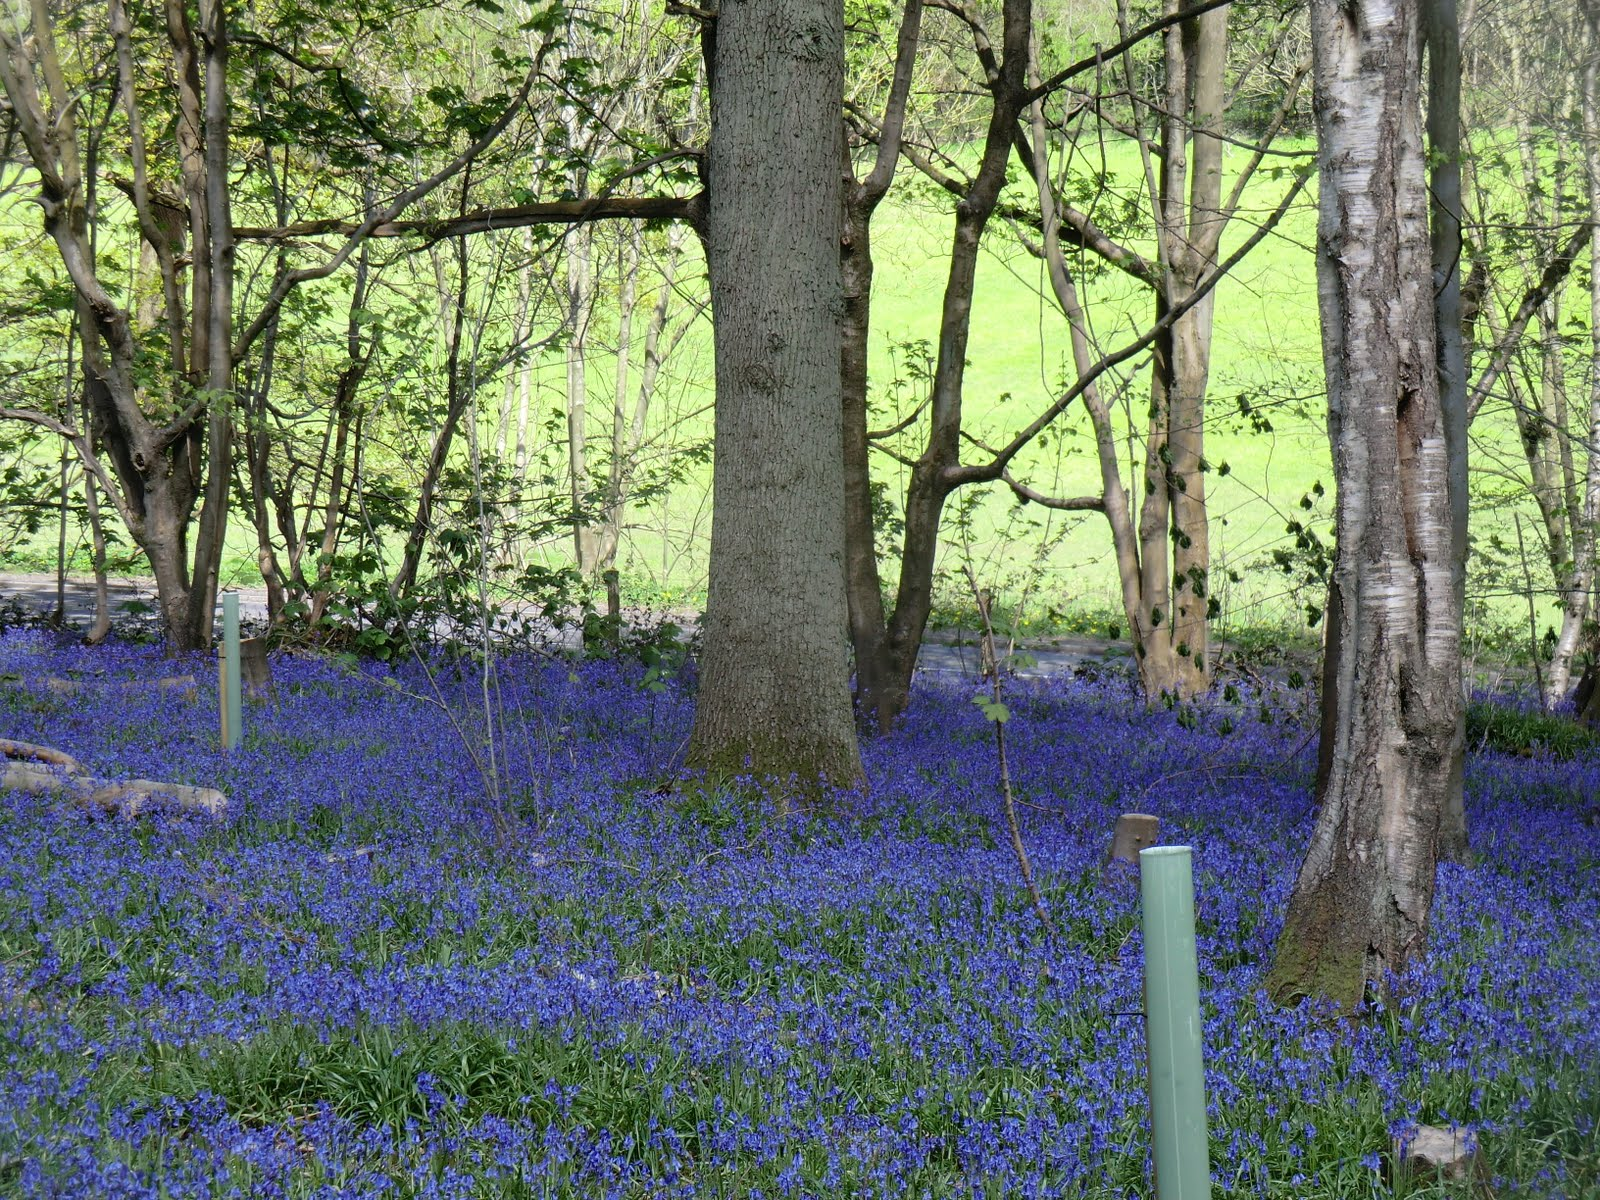 CIMG4174 Bluebells, Banstead Wood